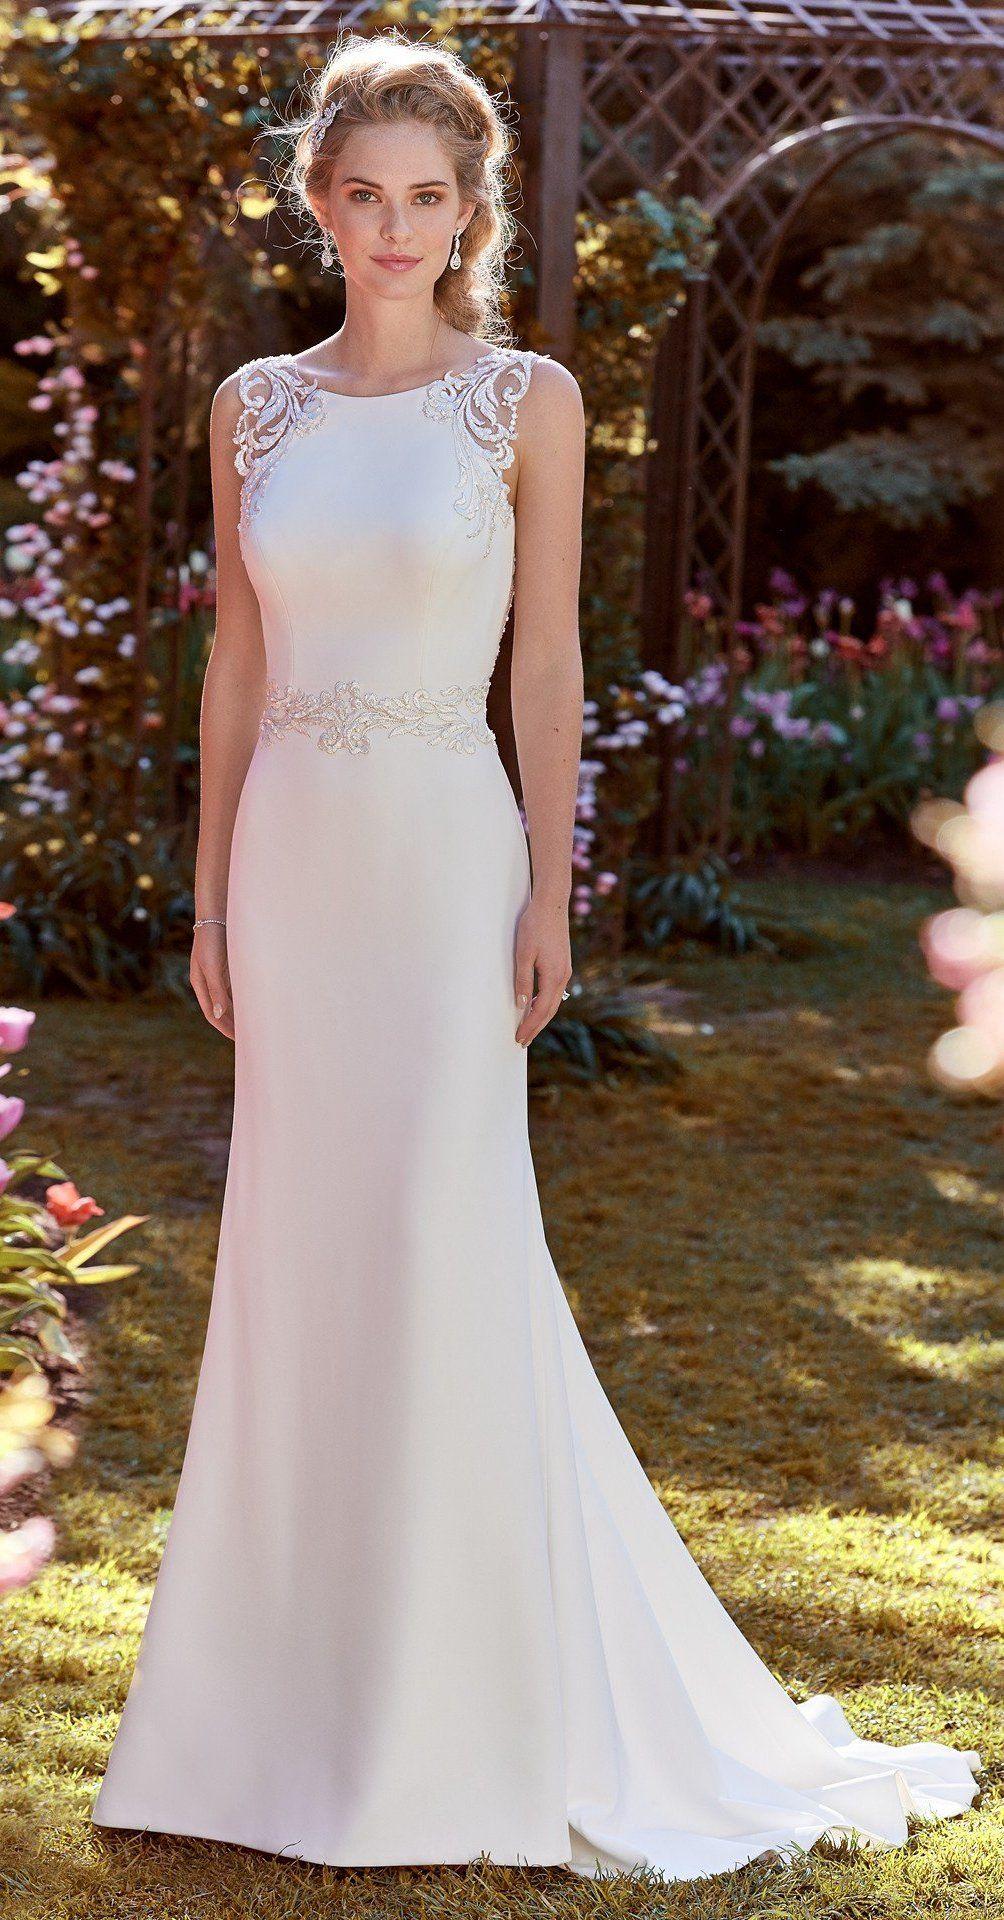 Ada By Rebecca Ingram Wedding Dresses In 2020 Elegant Wedding